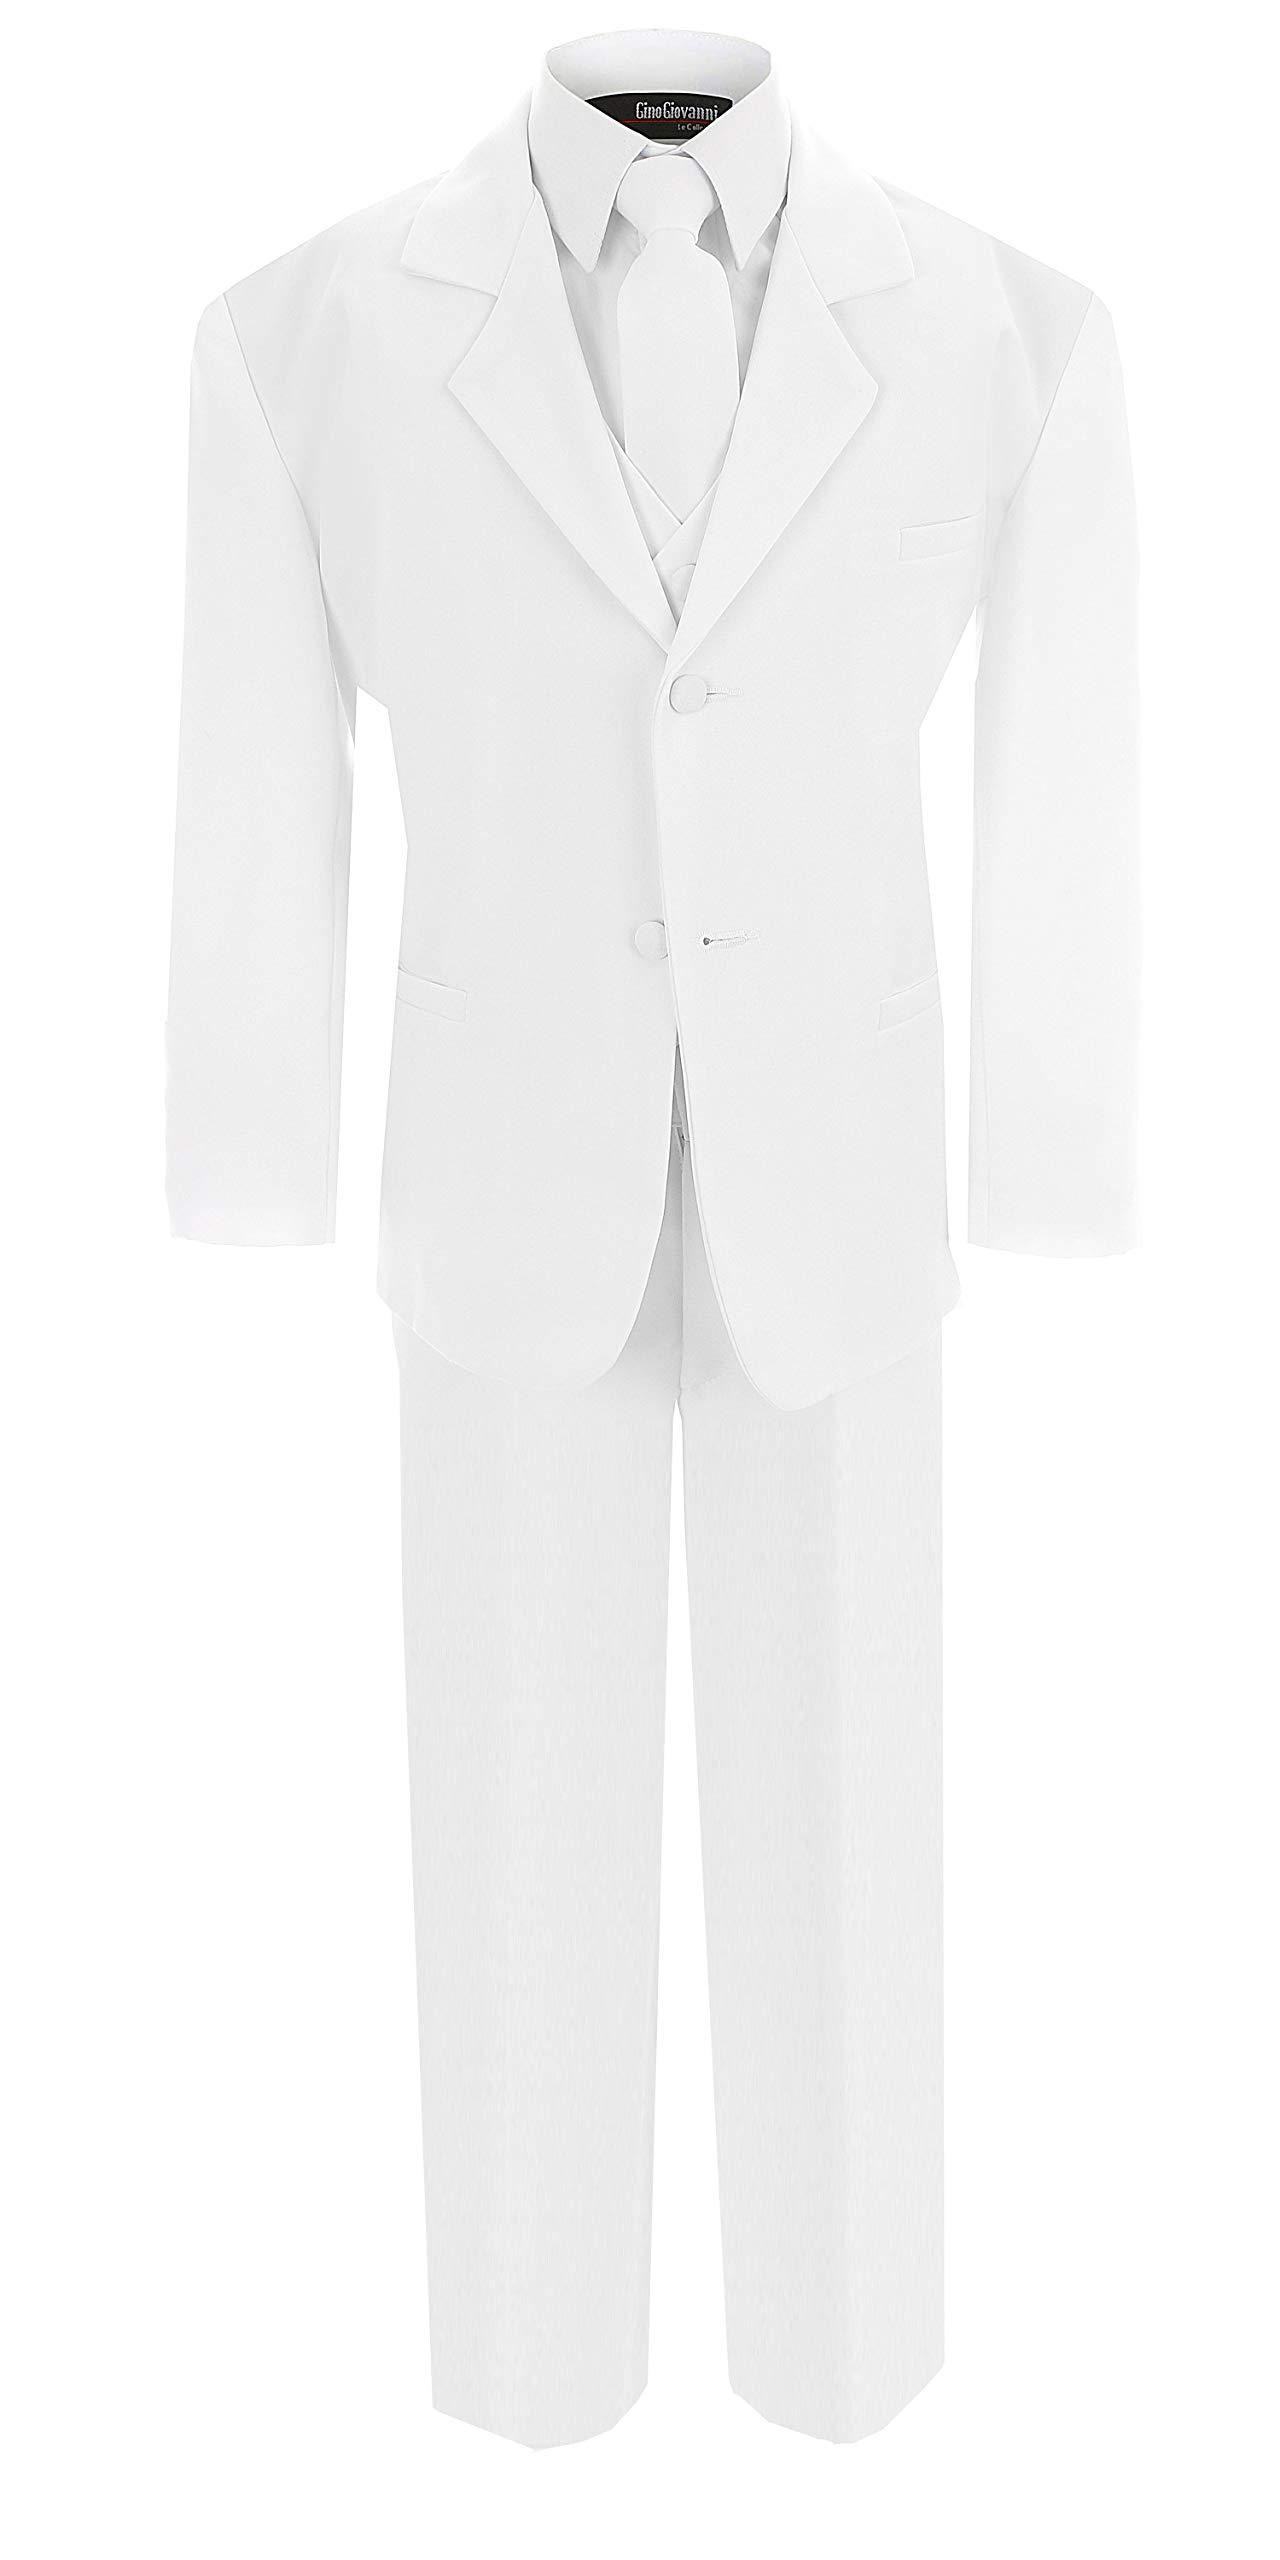 Boy's Formal Dresswear Set G214 (6, White Suit)